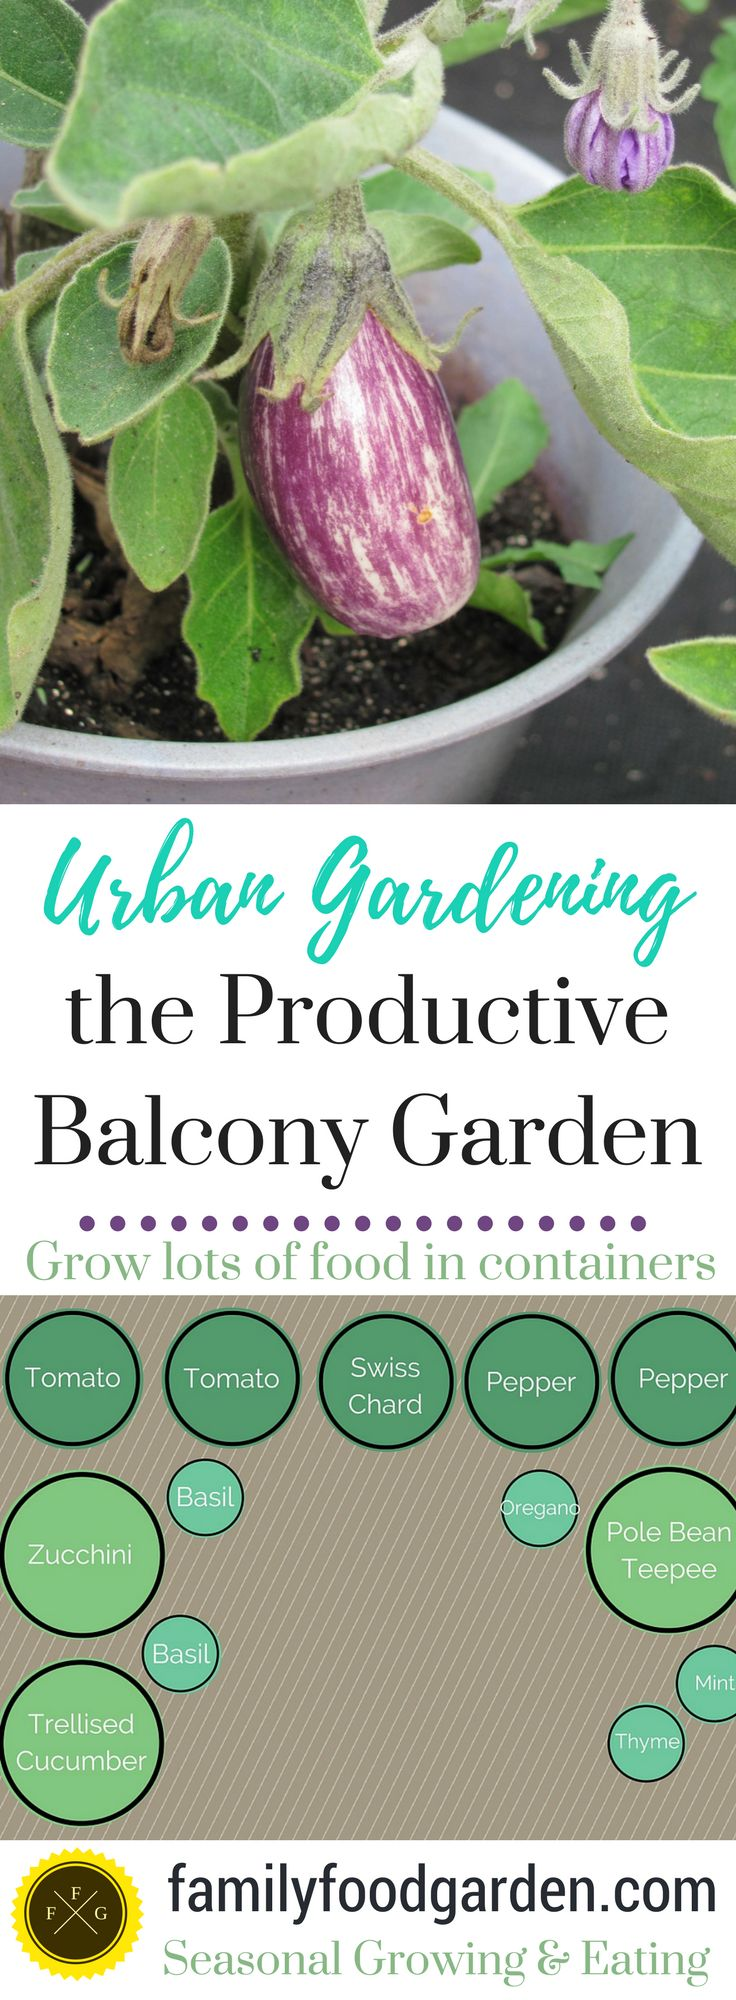 Urban gardening ideas containers - The Productive Balcony Garden